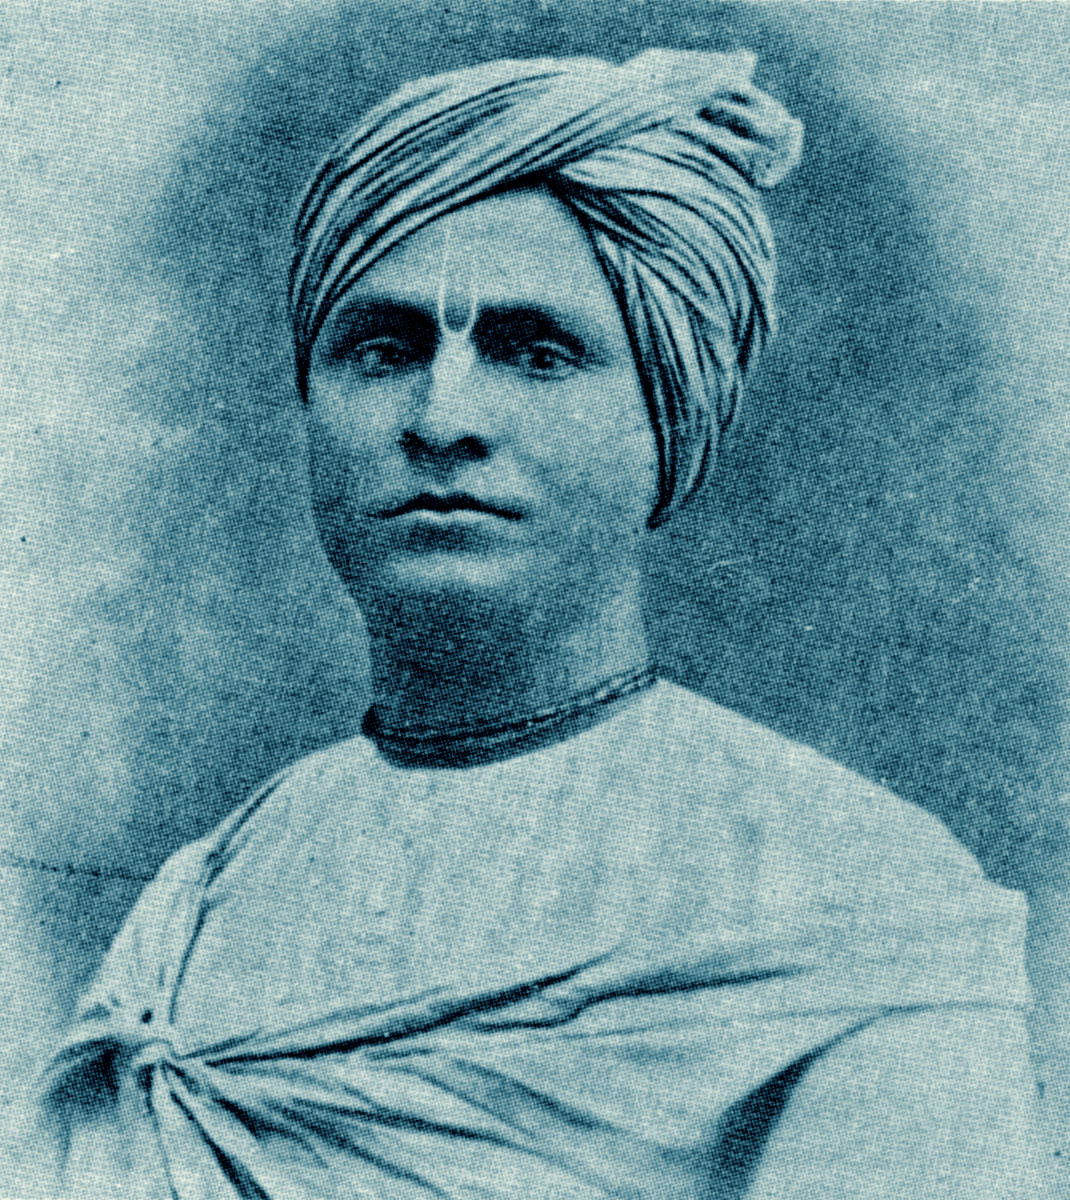 Yougn Sridhar Swami